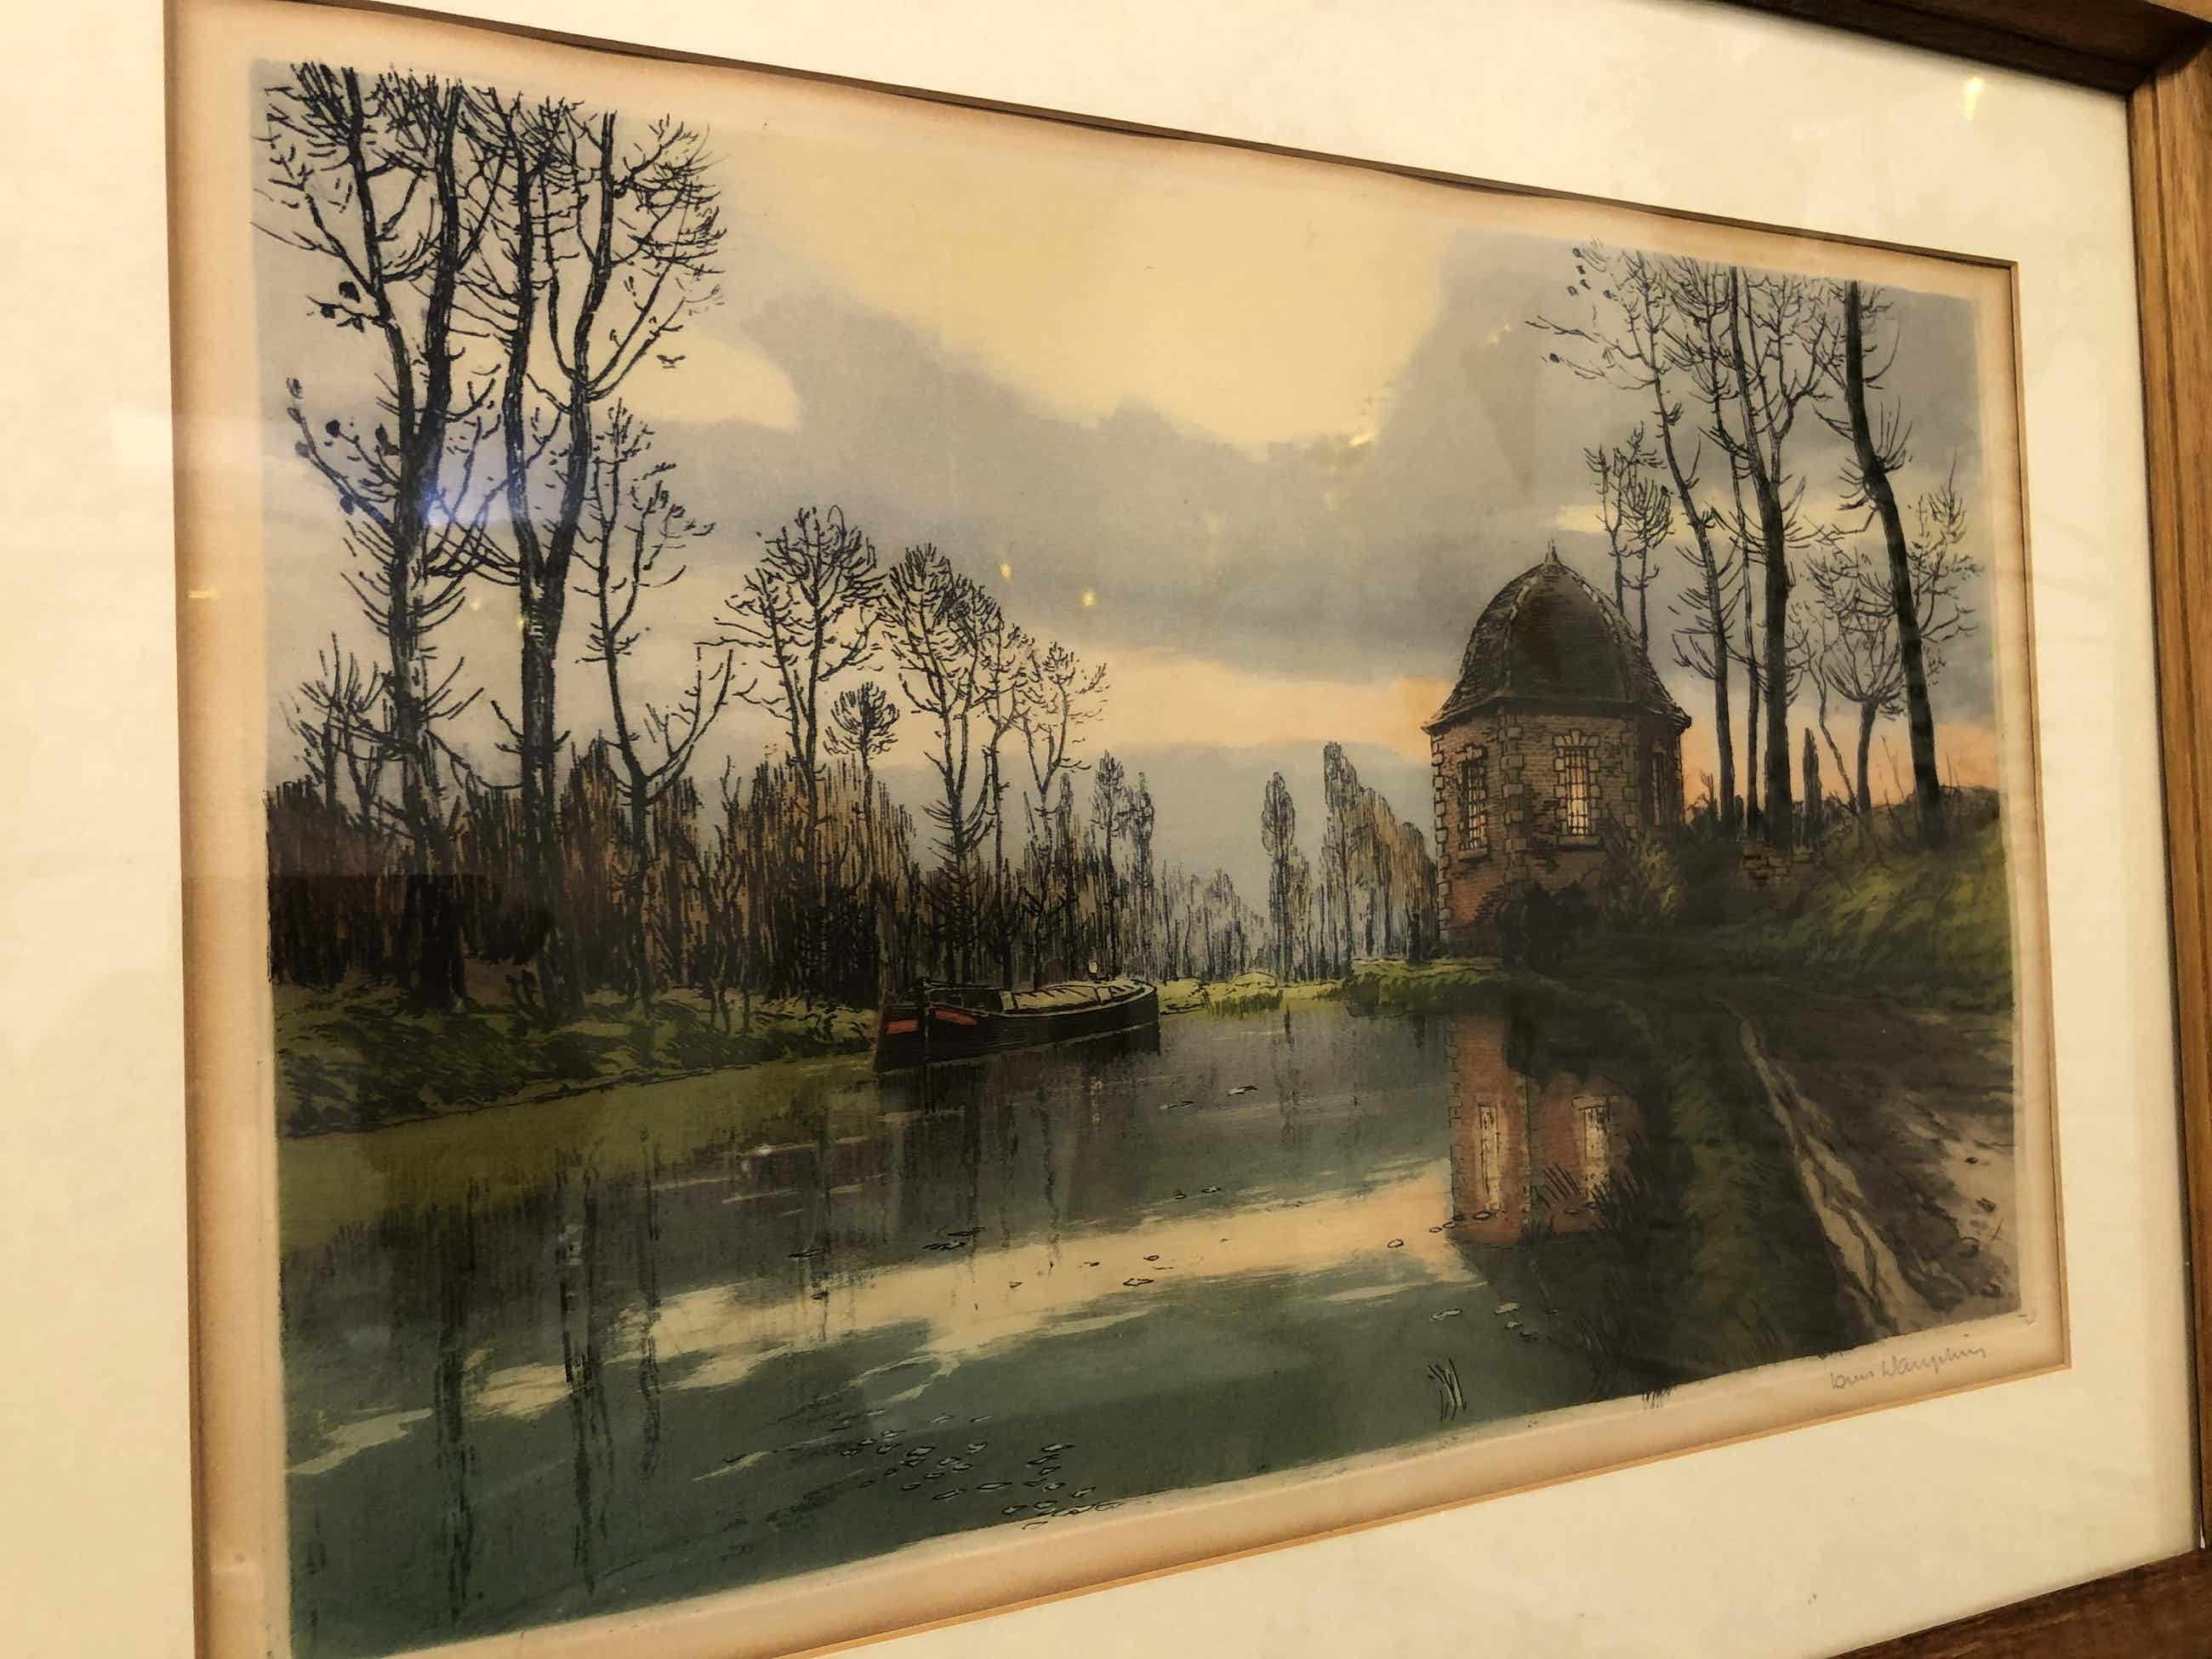 Louis-Etienne Dauphin - Waterland kopen? Bied vanaf 55!